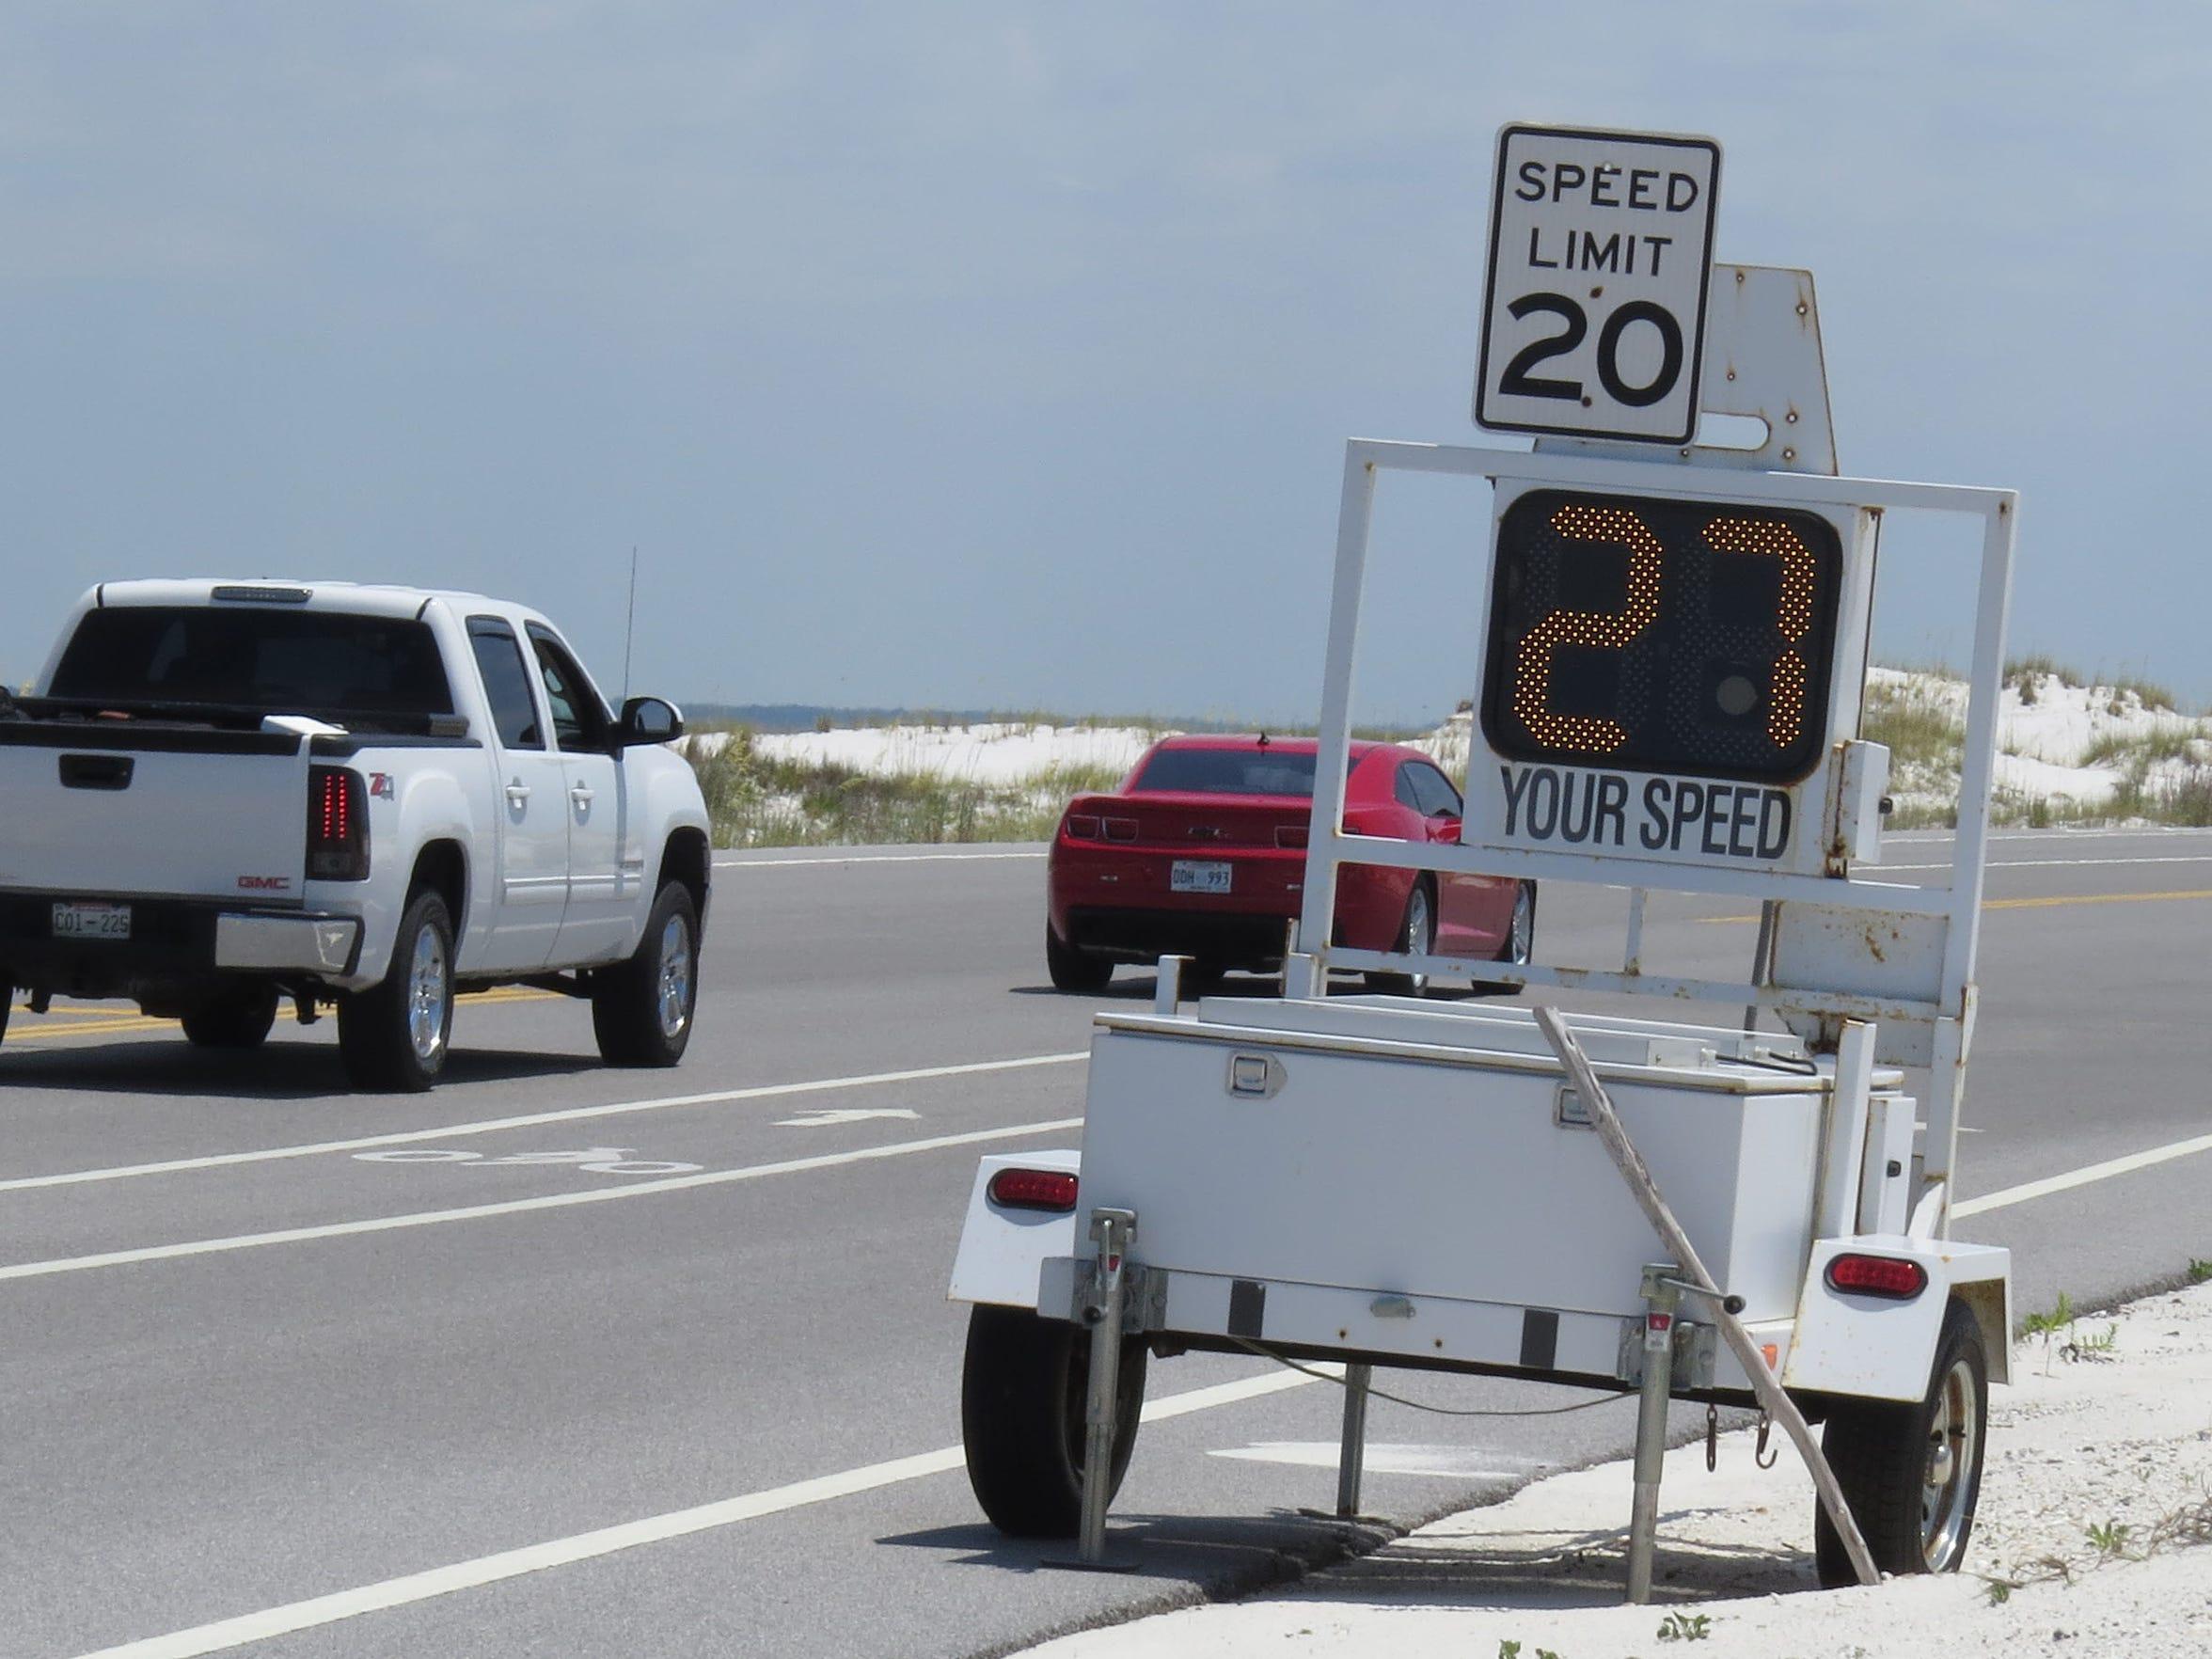 Speed advisory signs are put up around the shorebird